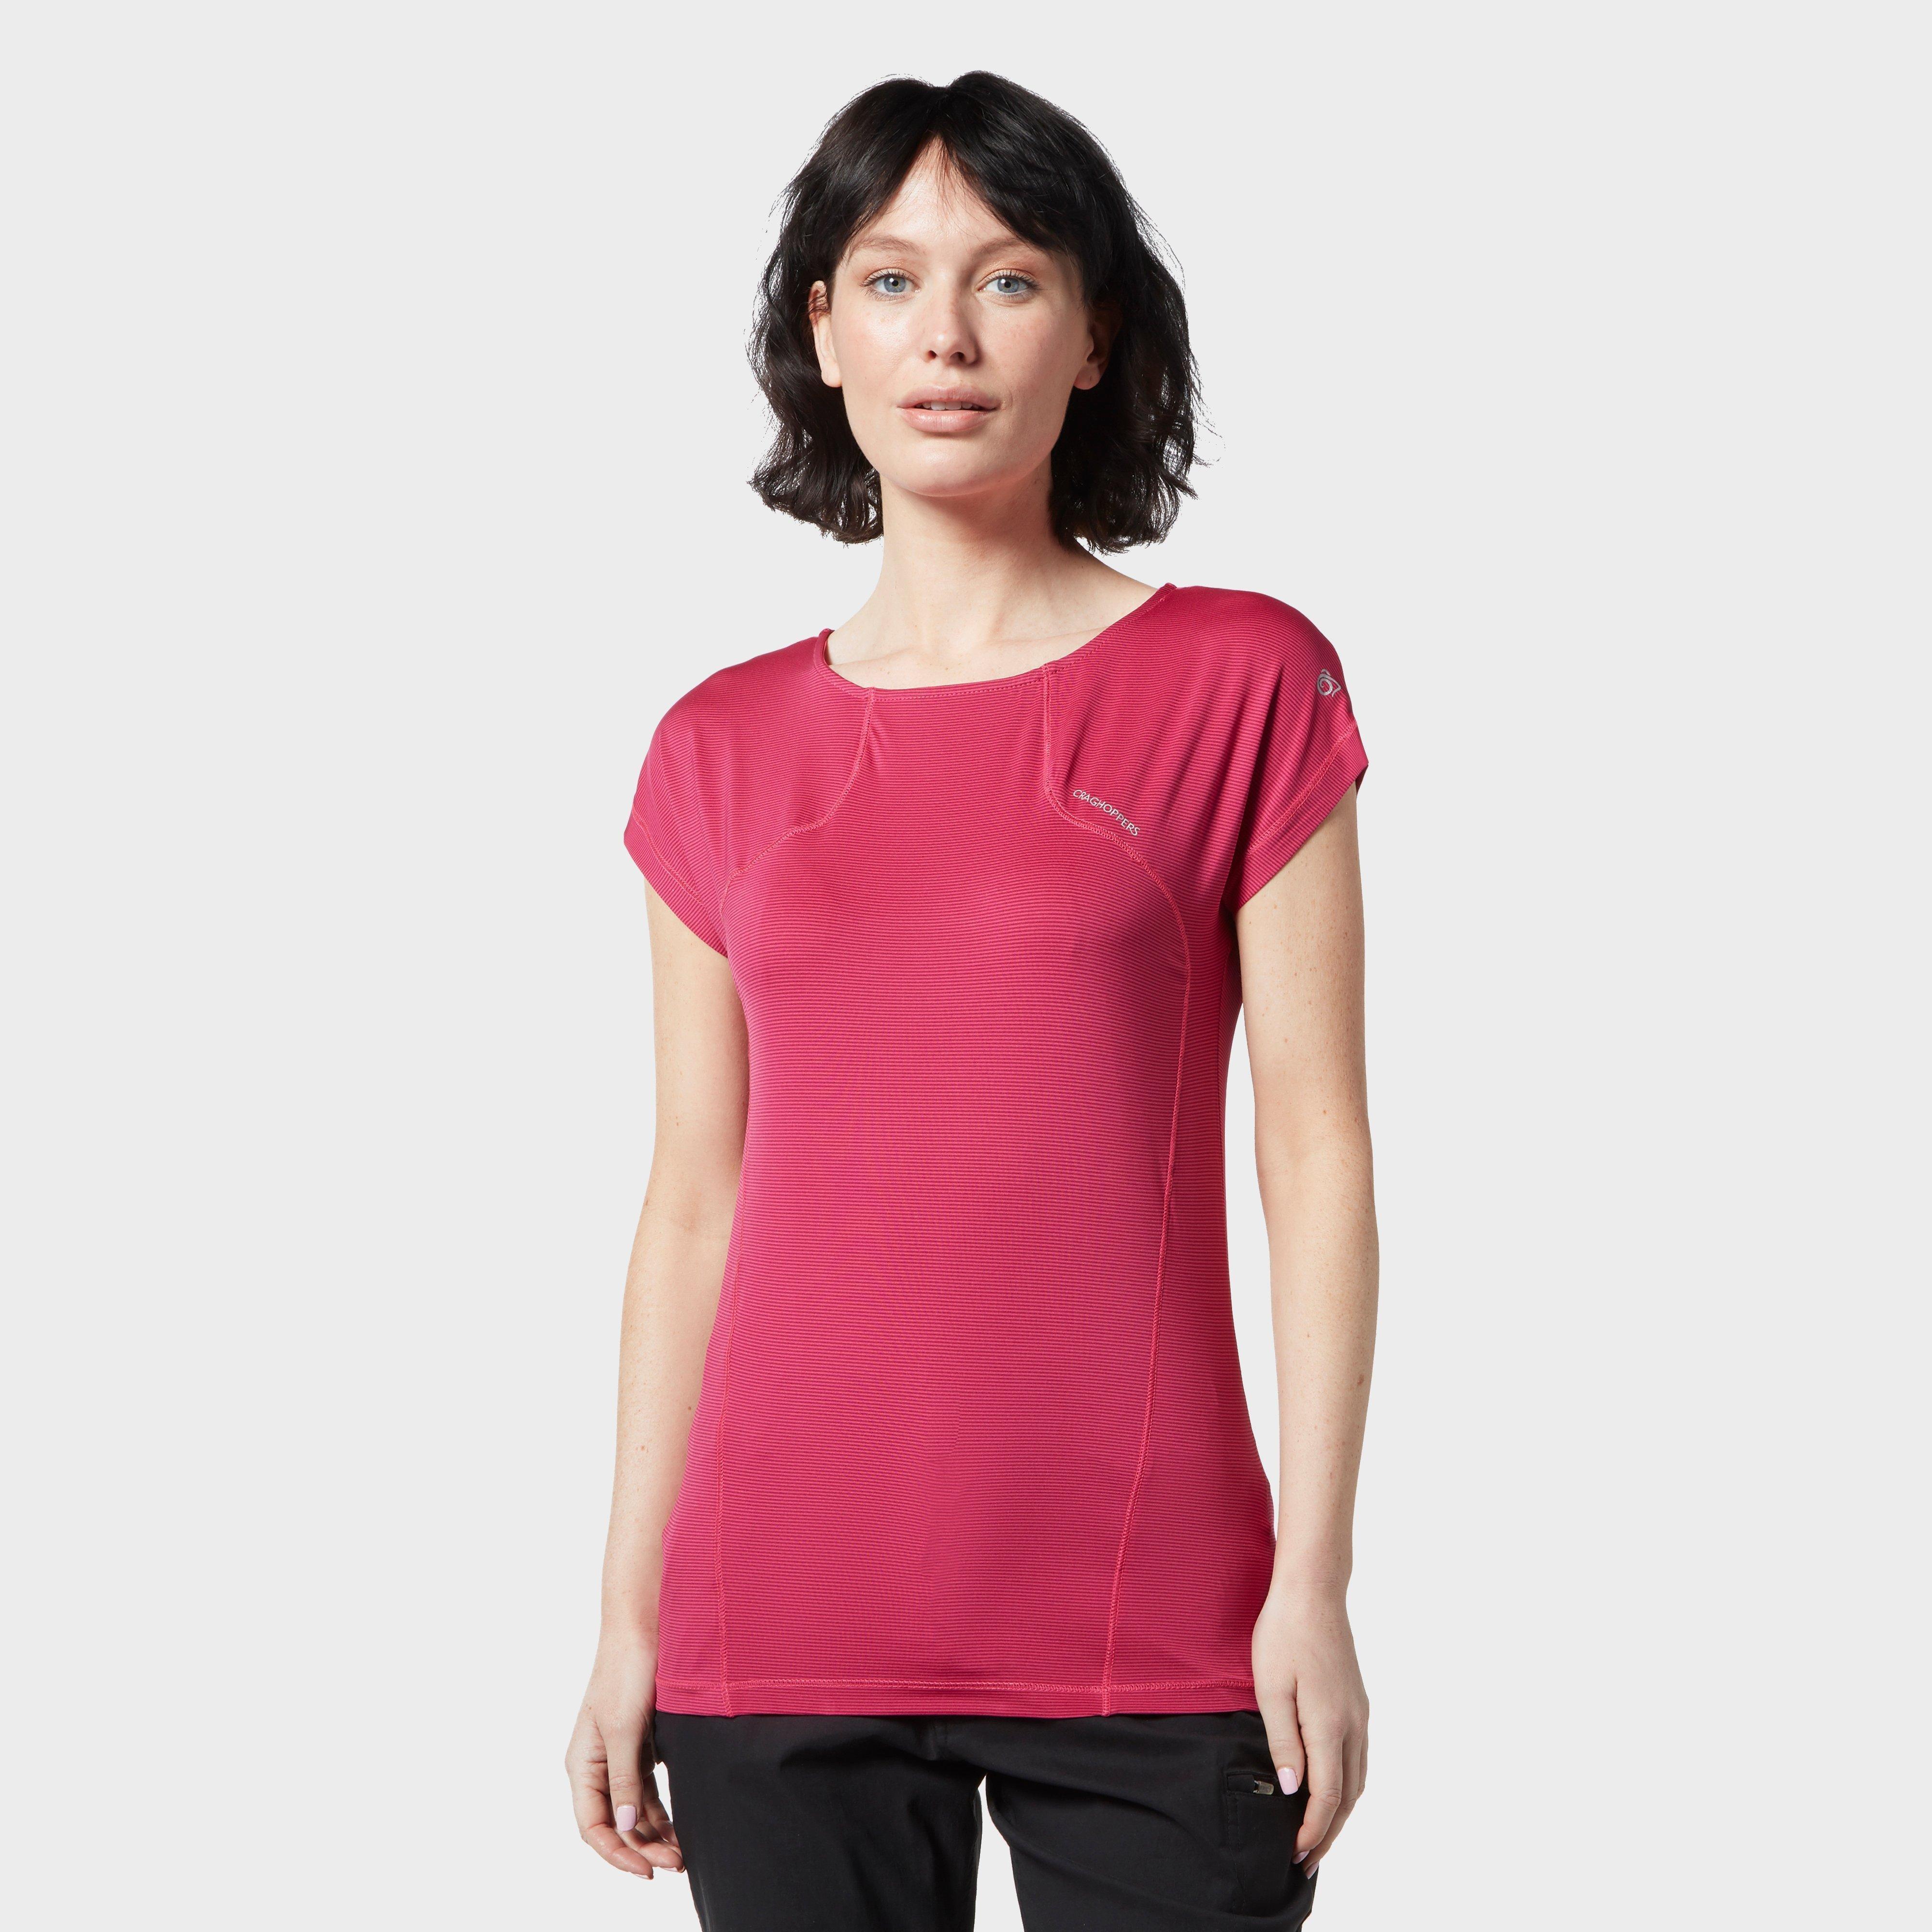 Image of Craghoppers Women's Fusion T-Shirt - Pink/Pnk, Pink/PNK